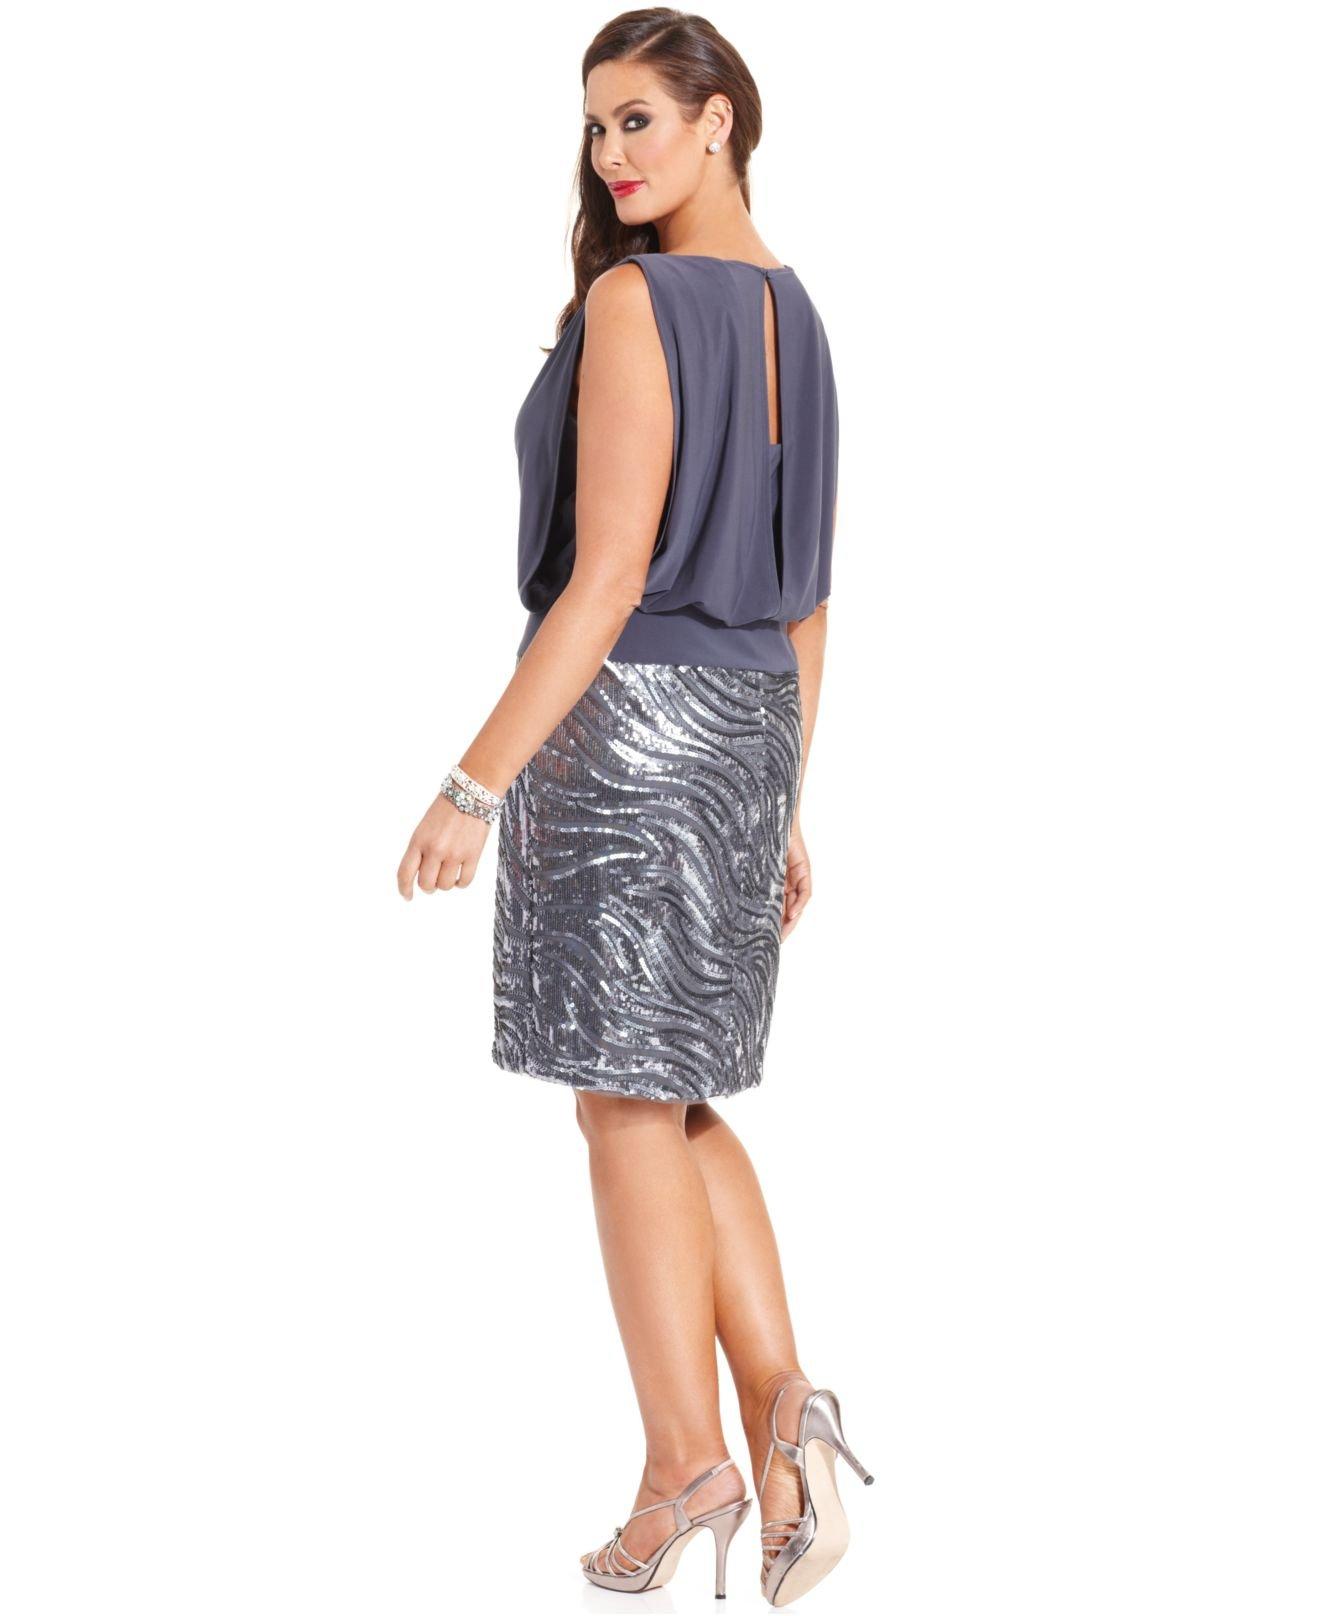 Betsy & Adam Plus Size Sequin Blouson Dress in Gray - Lyst